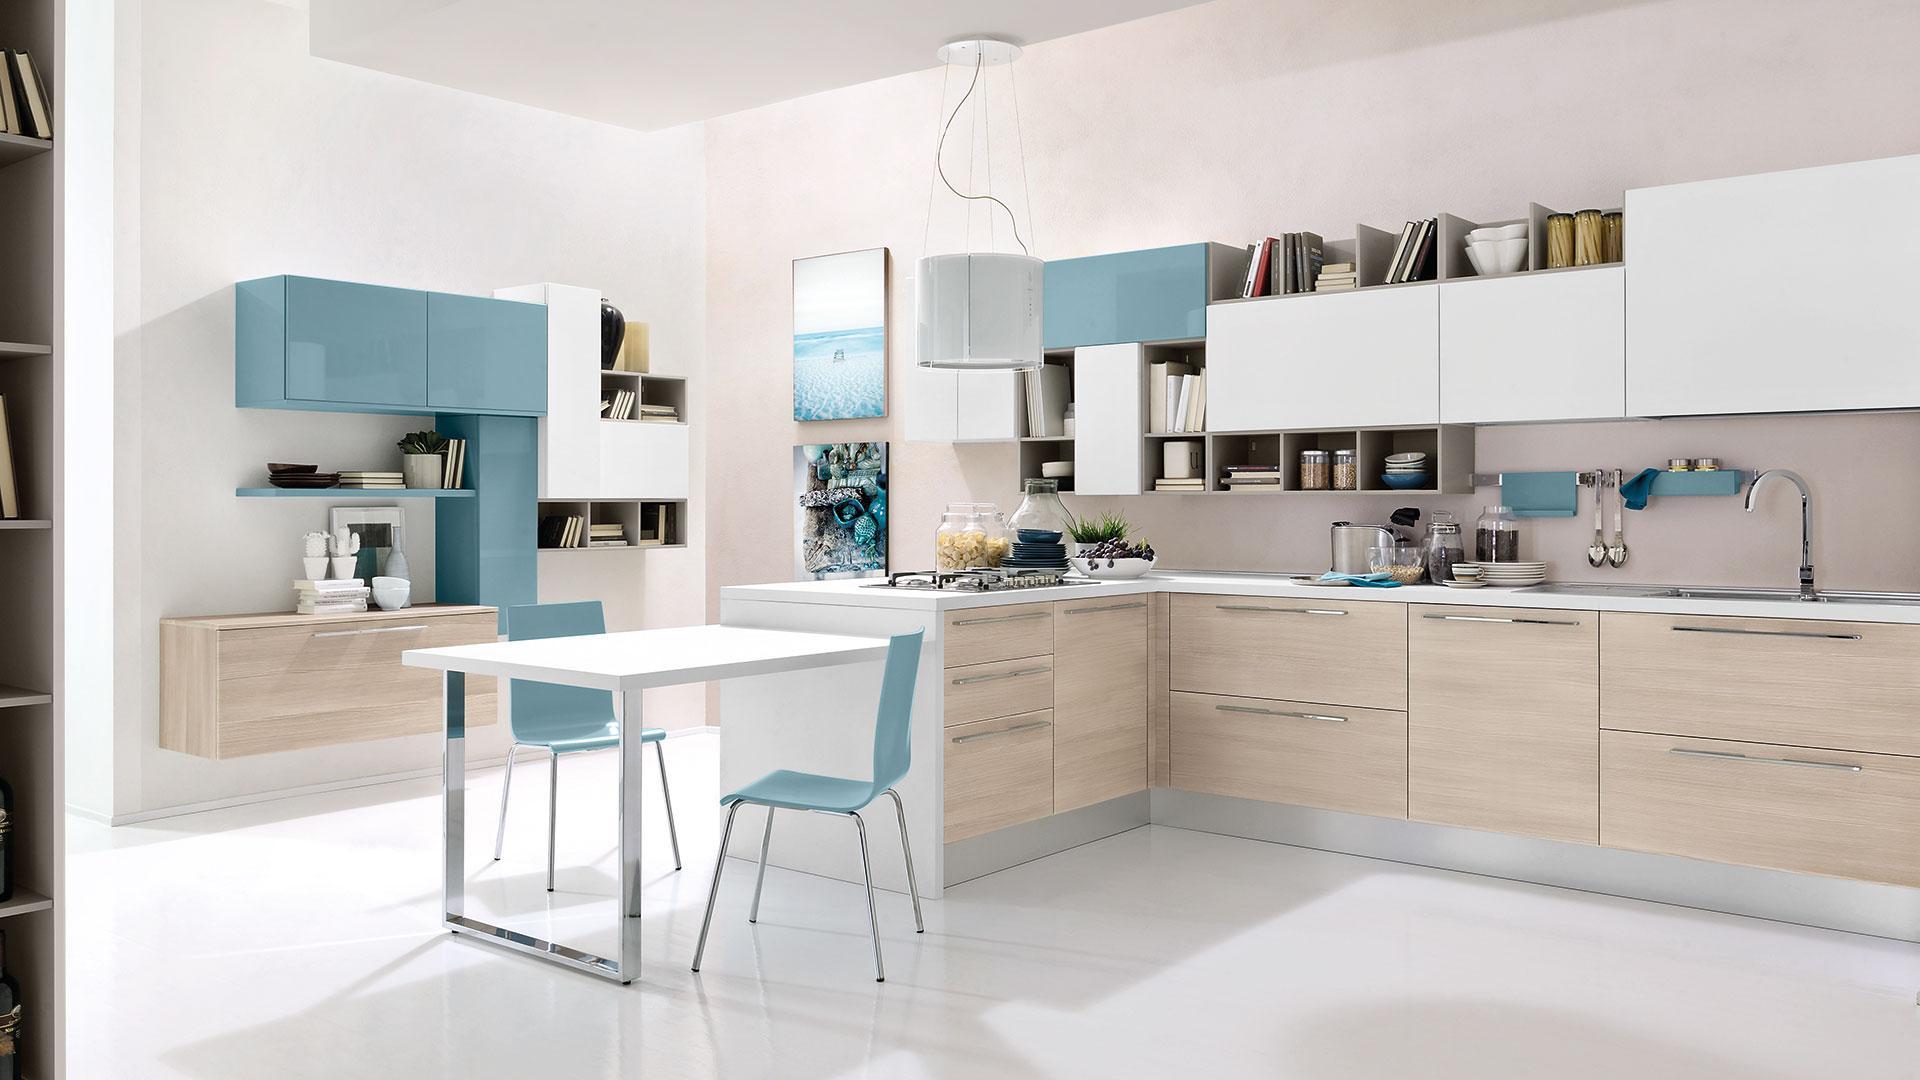 Emejing Cucine Lube Torino Gallery - Amazing House Design ...